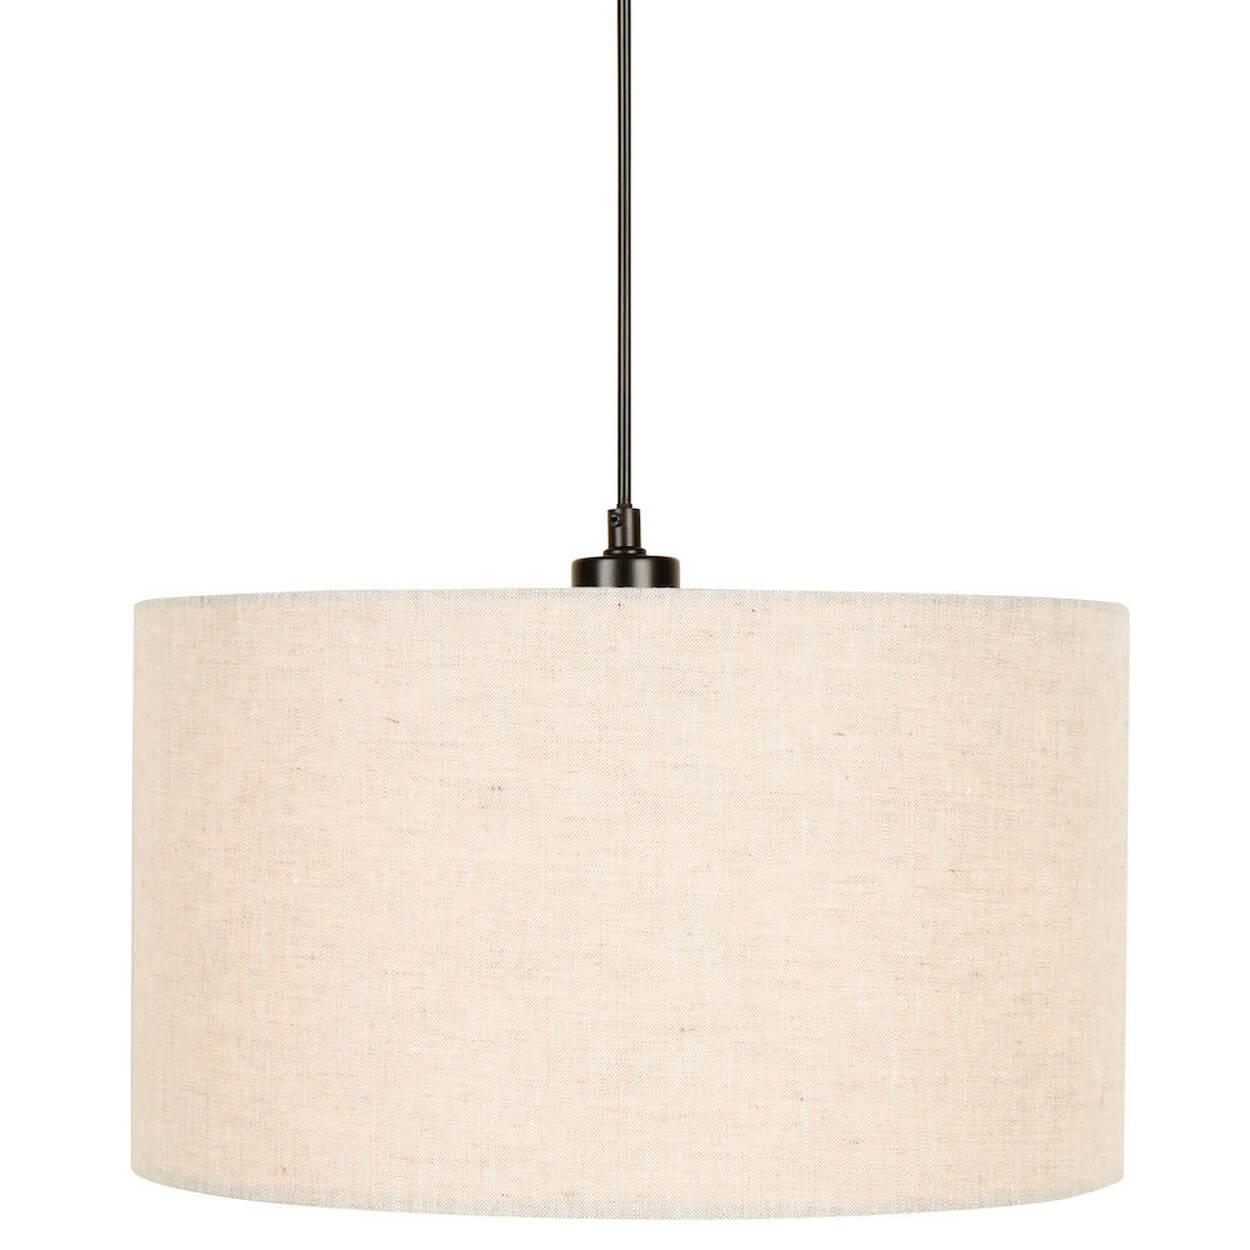 Round Linen Ceiling Lamp Bouclair